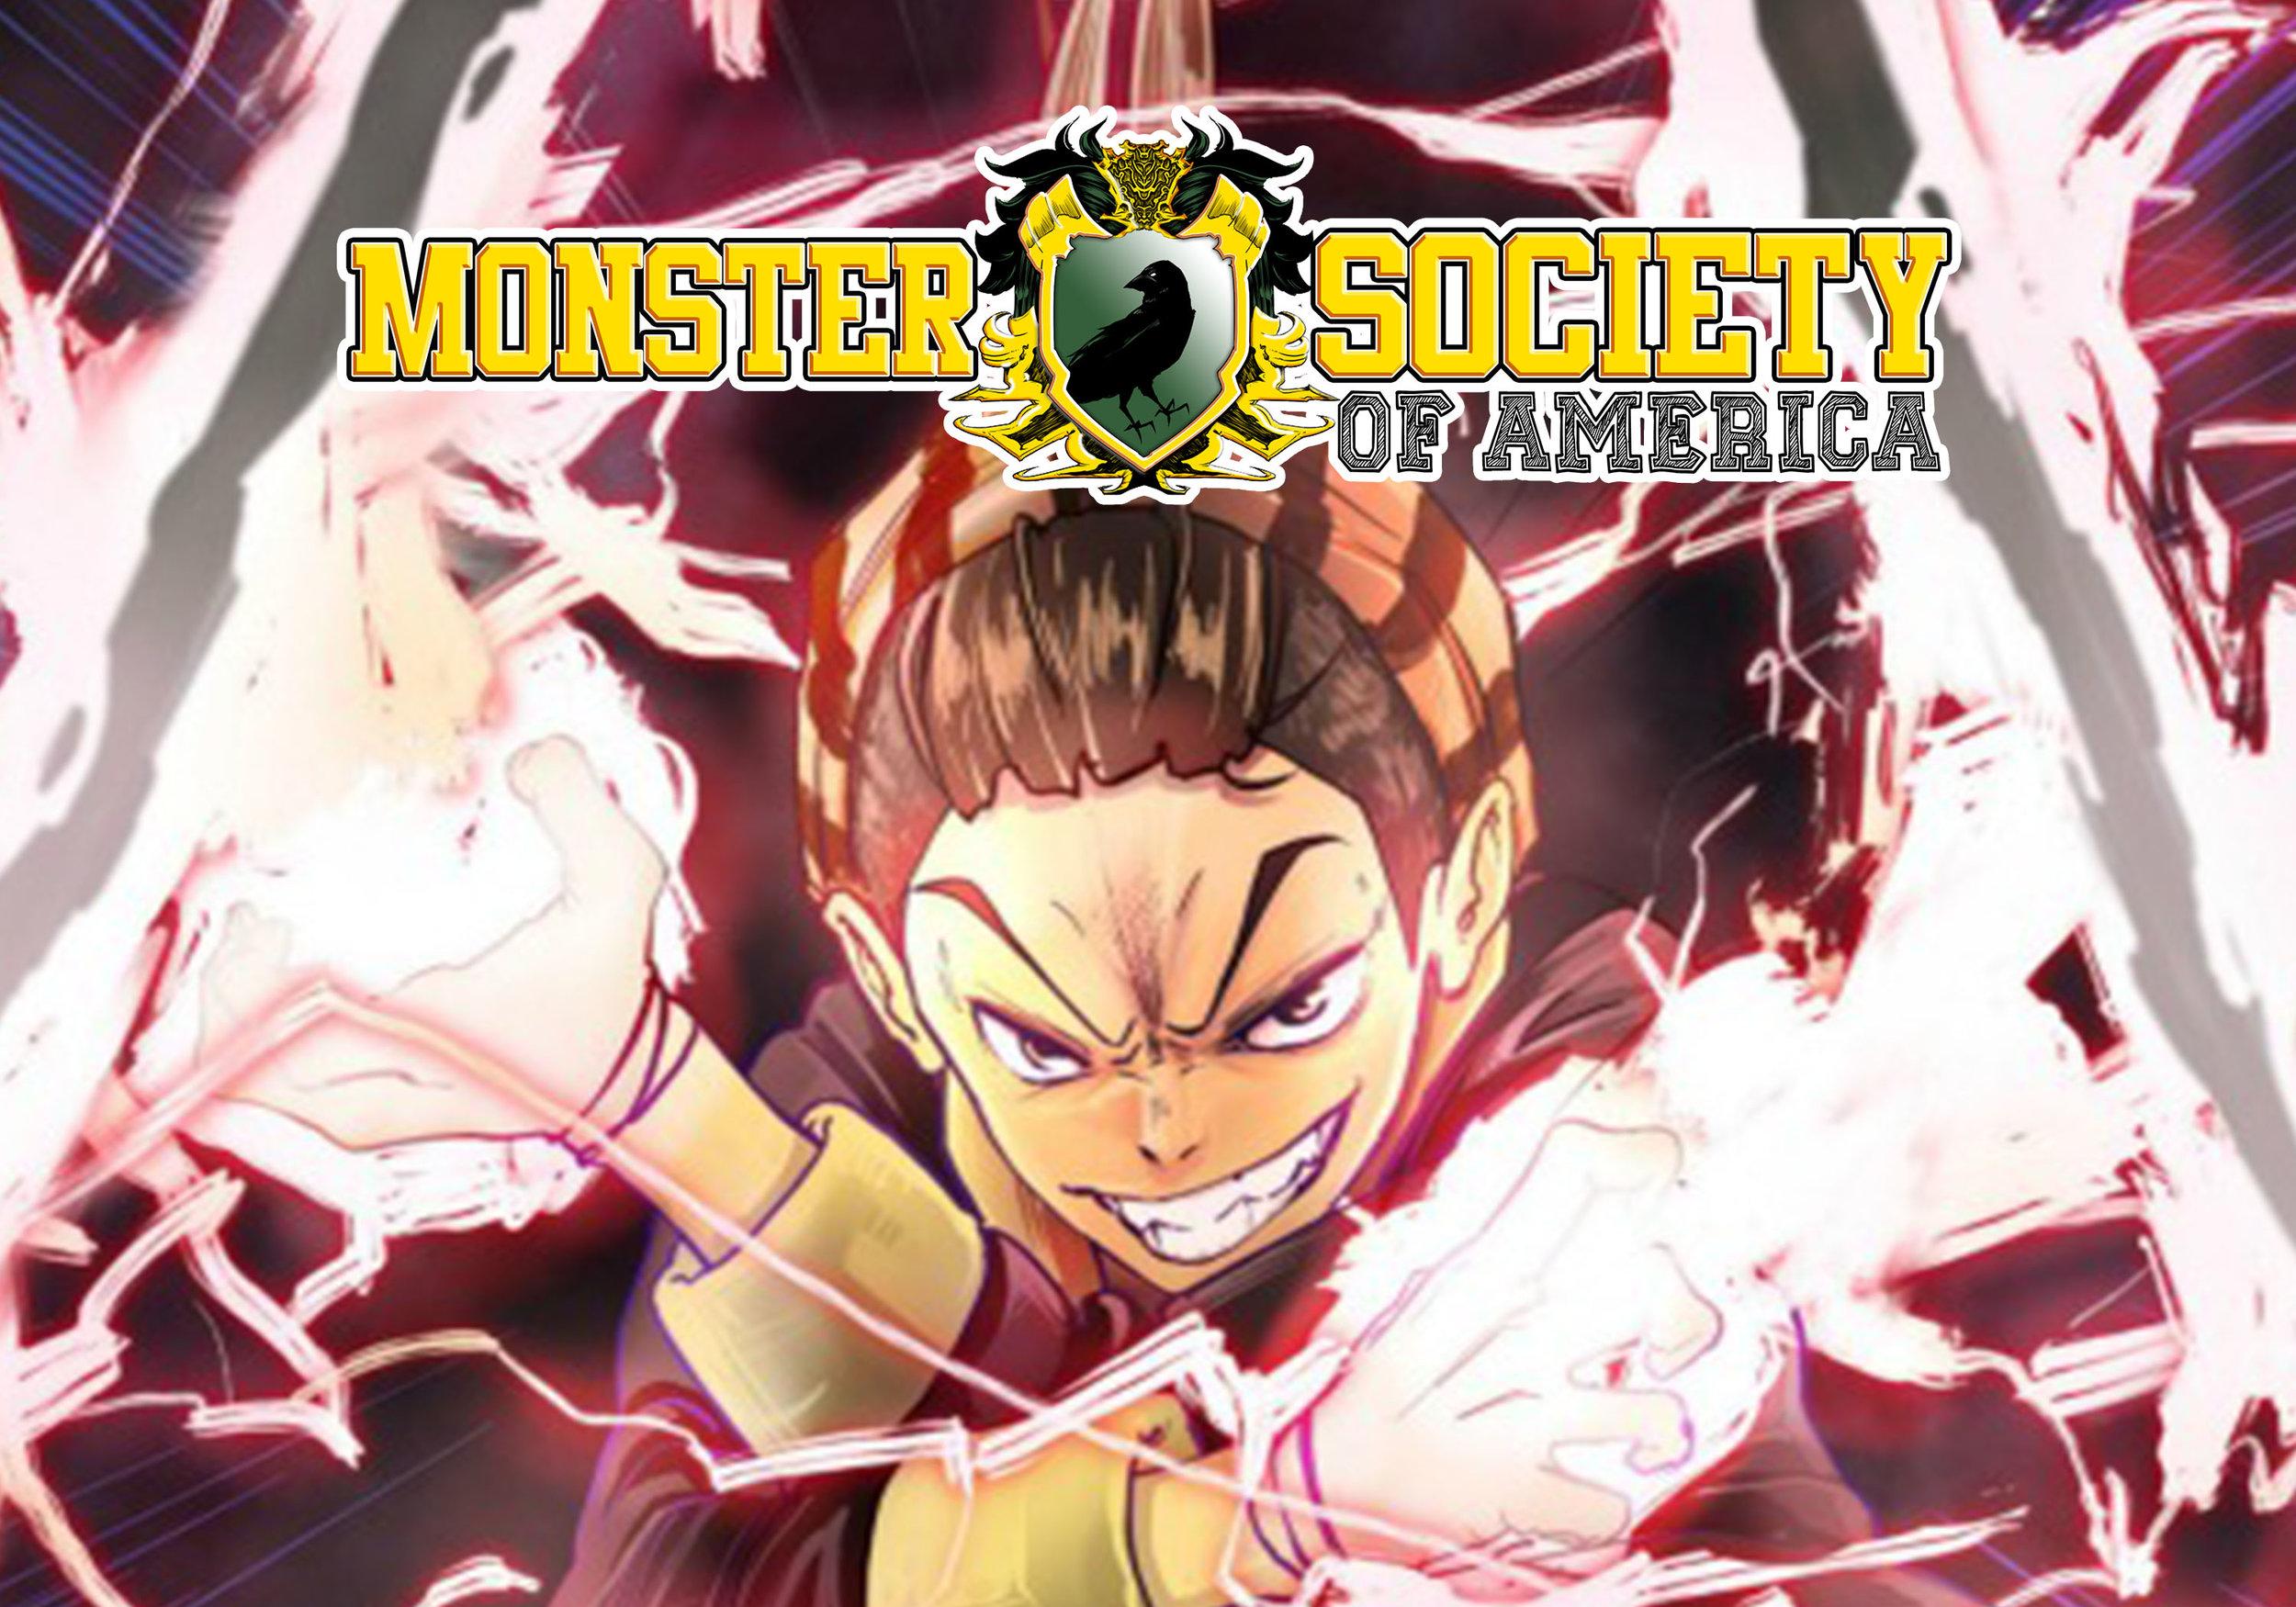 MONSTER SOCIETY